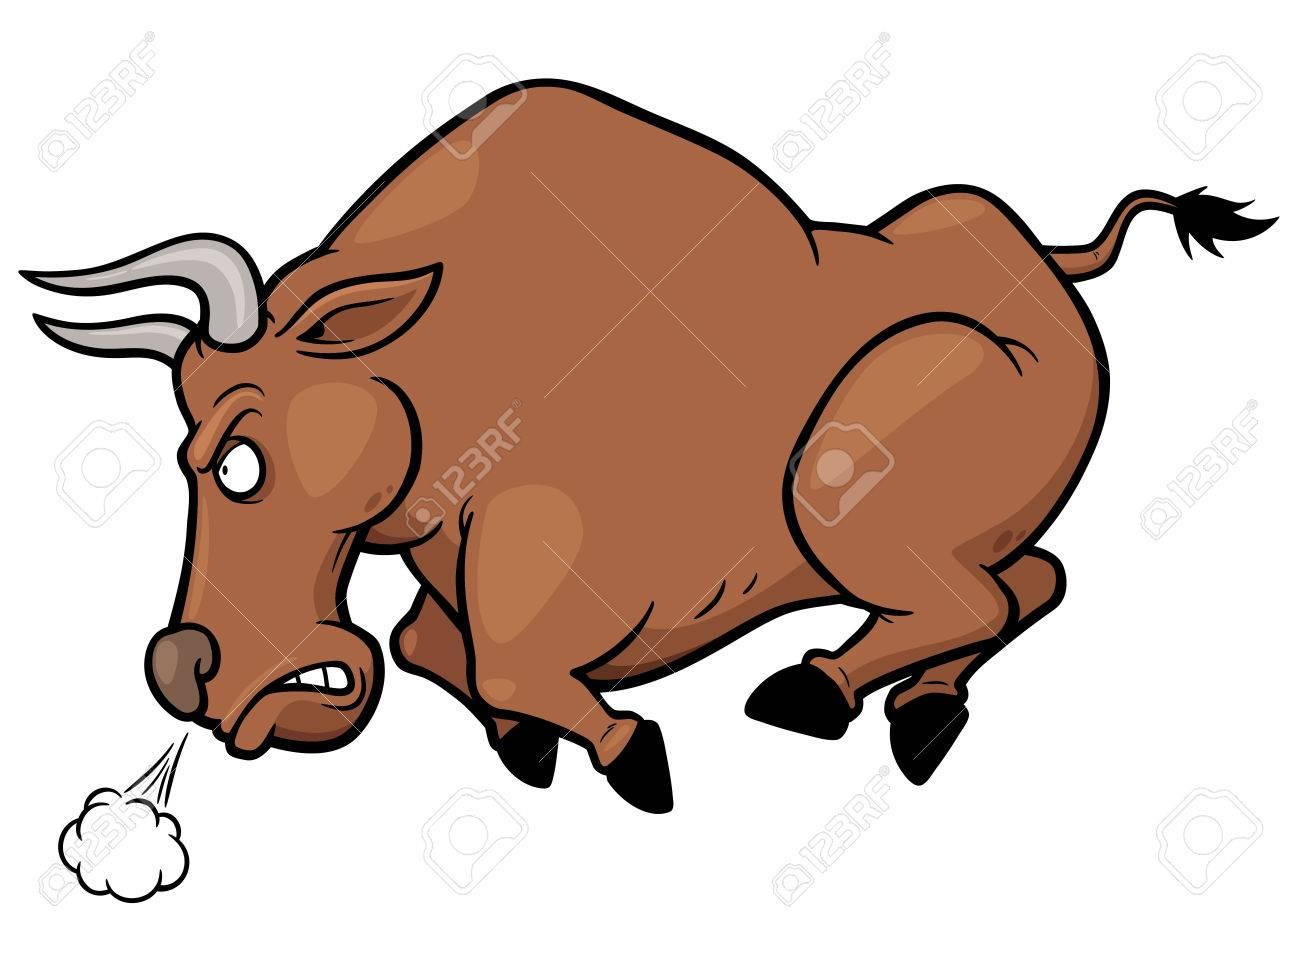 Vector illustration of cartoon Angry bull - 36008783